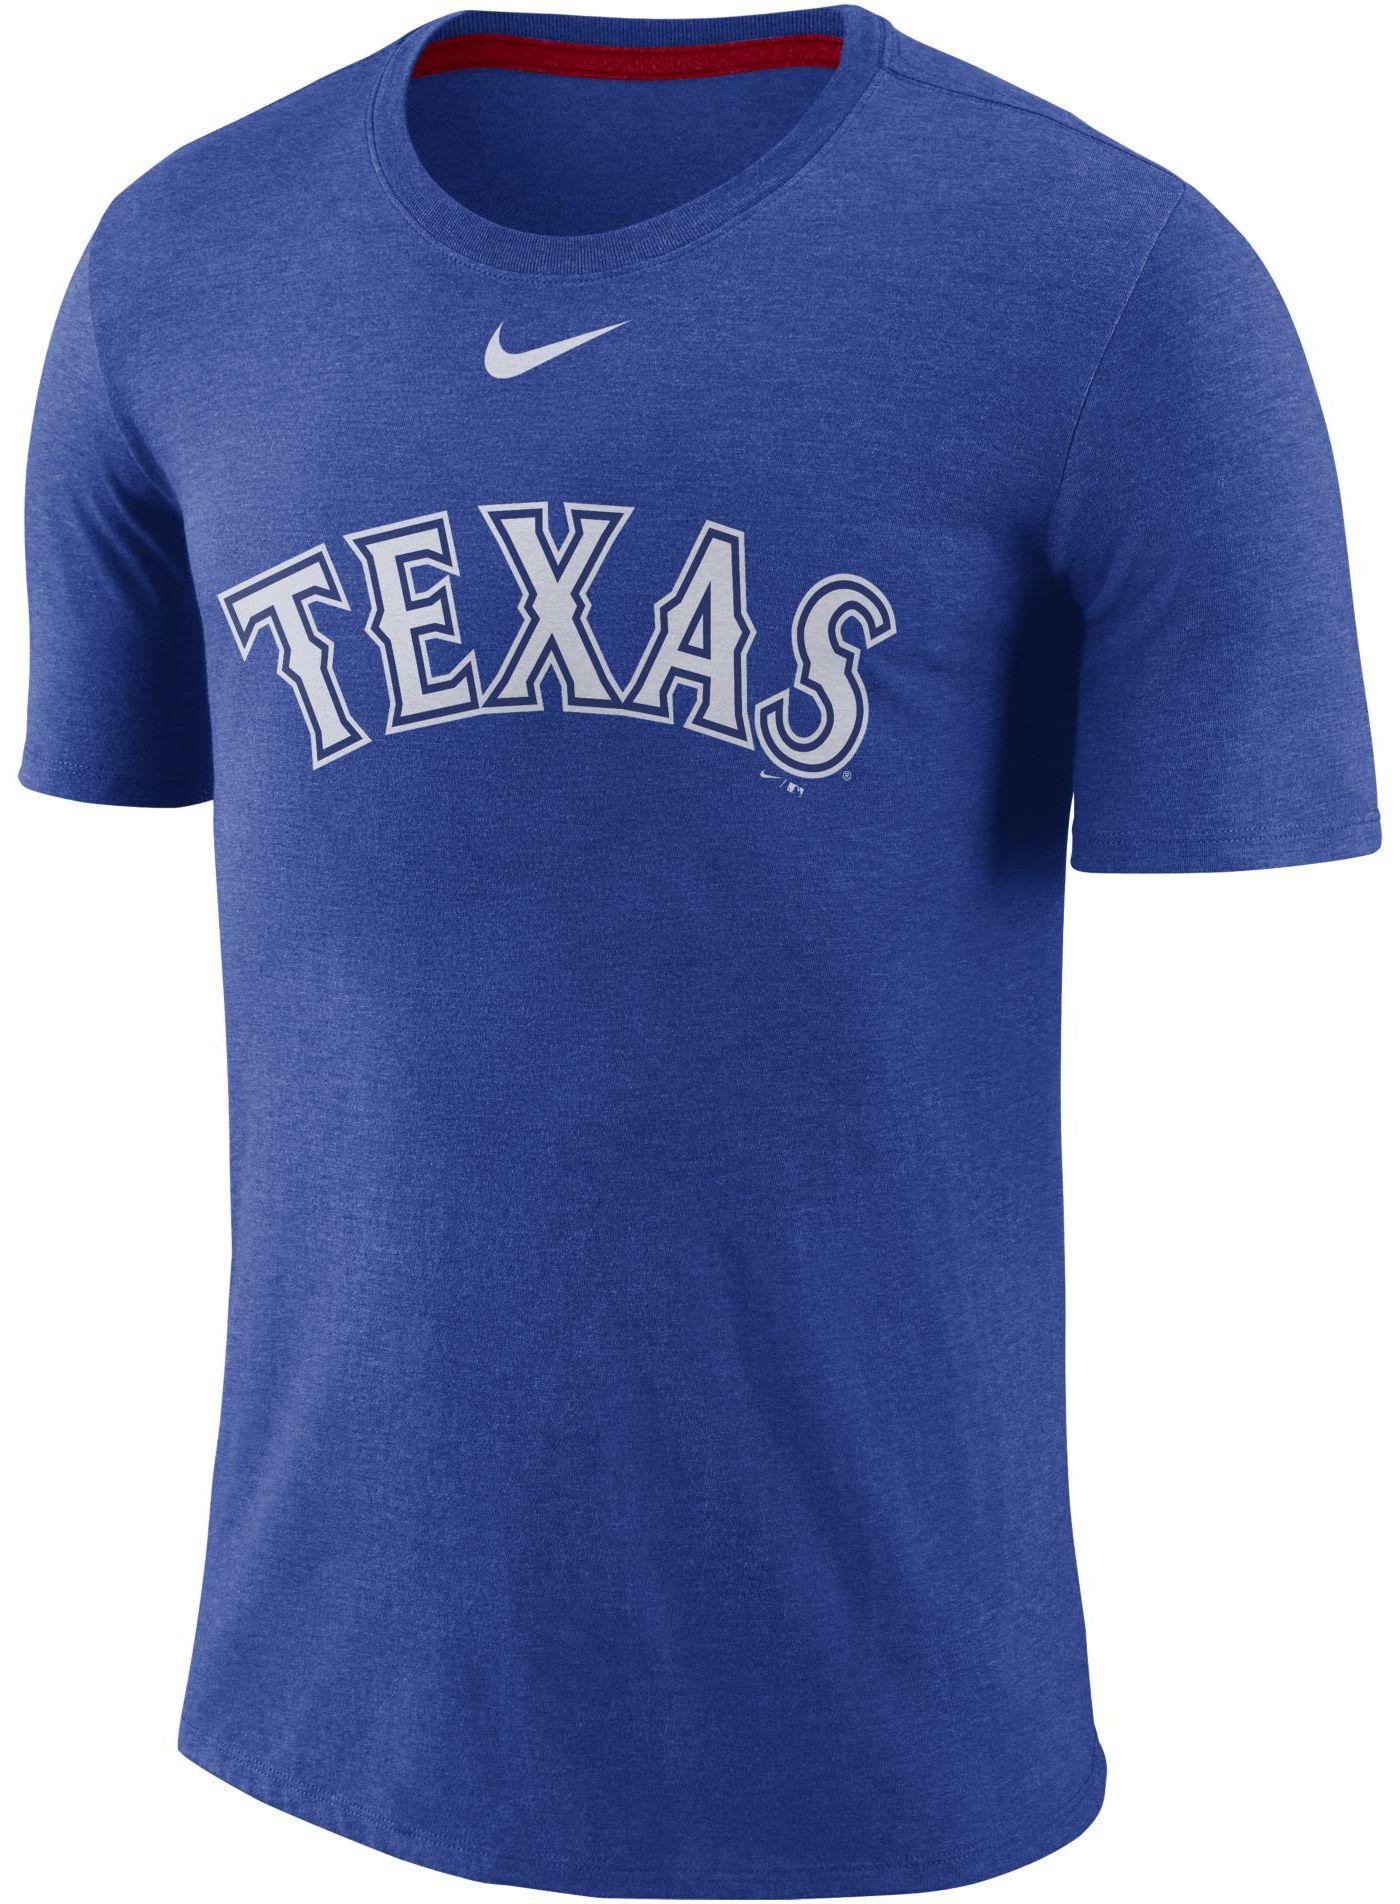 Nike Men's Texas Rangers Tri-Blend T-Shirt